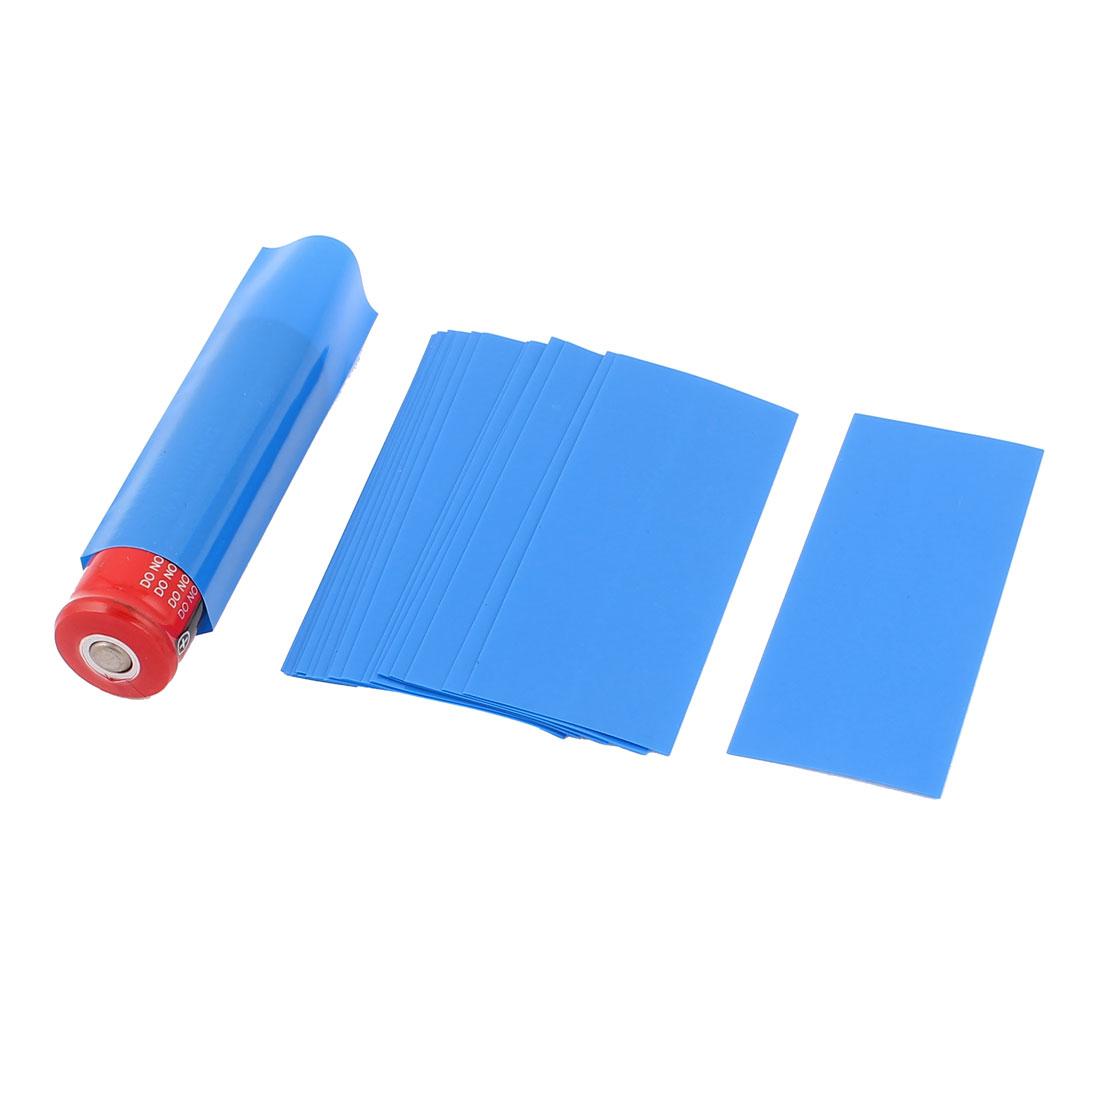 20pcs 18.5mm Dia PVC Heat Shrink Tubing Blue for 1 x 18650/18500 Battery